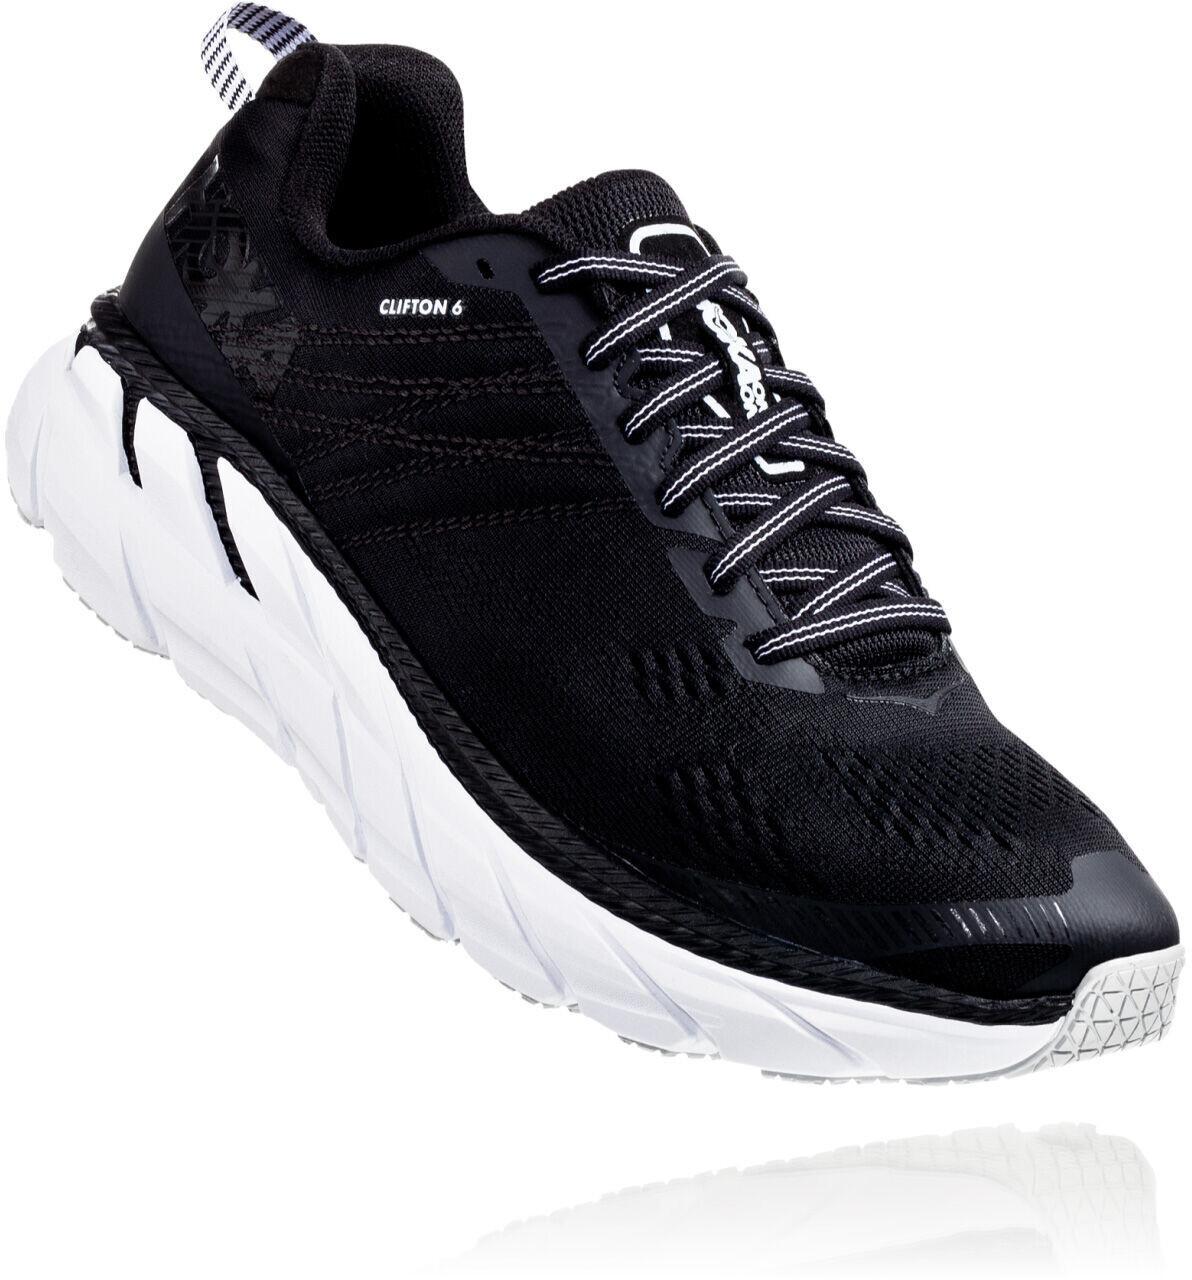 Hoka One One Clifton 6 Løbesko Herrer, black/white (2020) | Running shoes